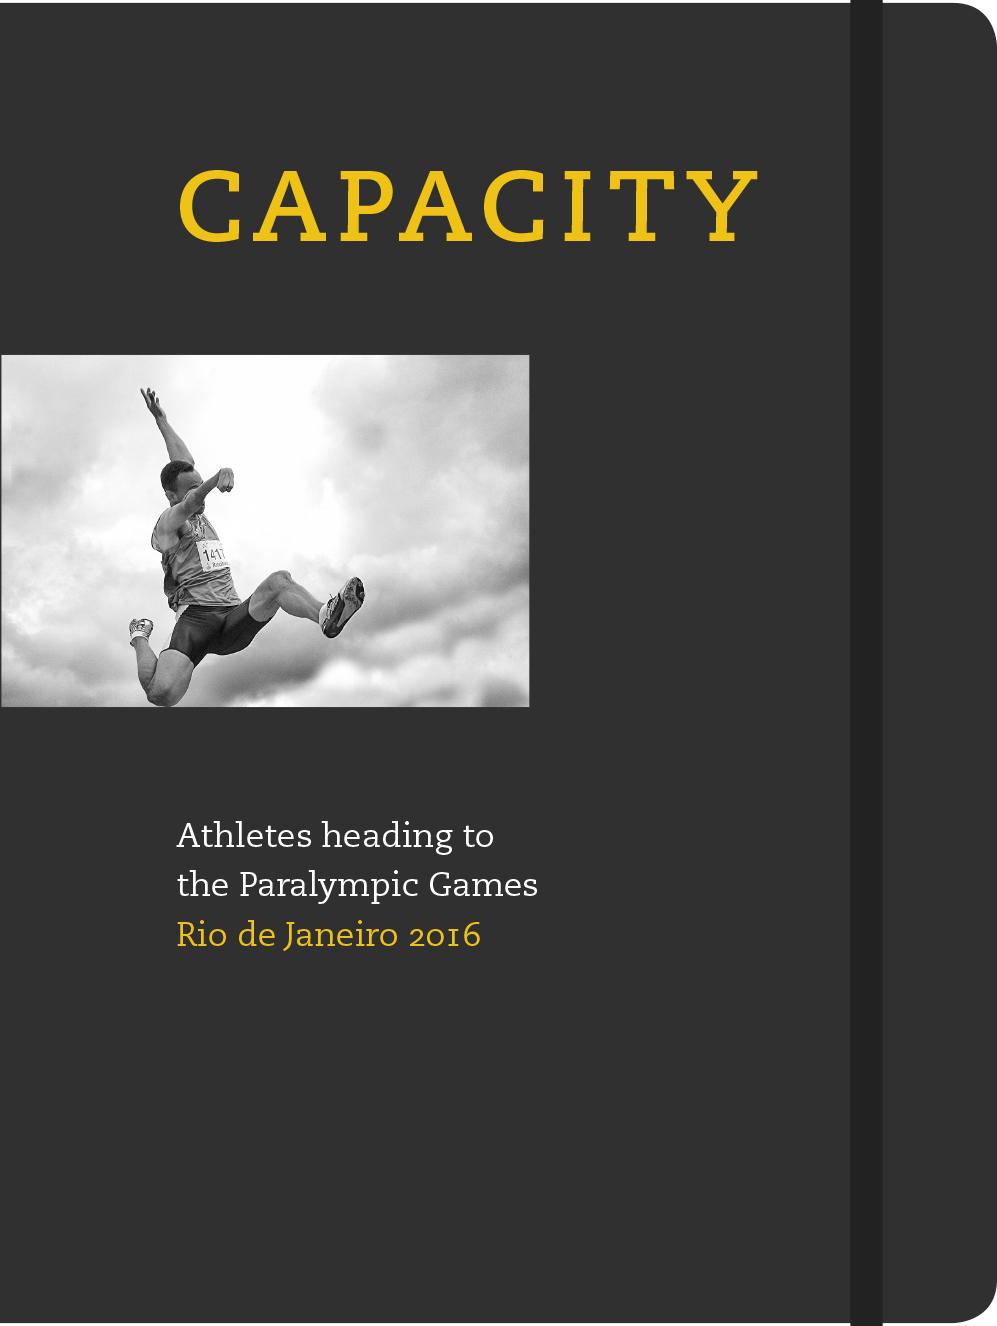 capacity_01-1